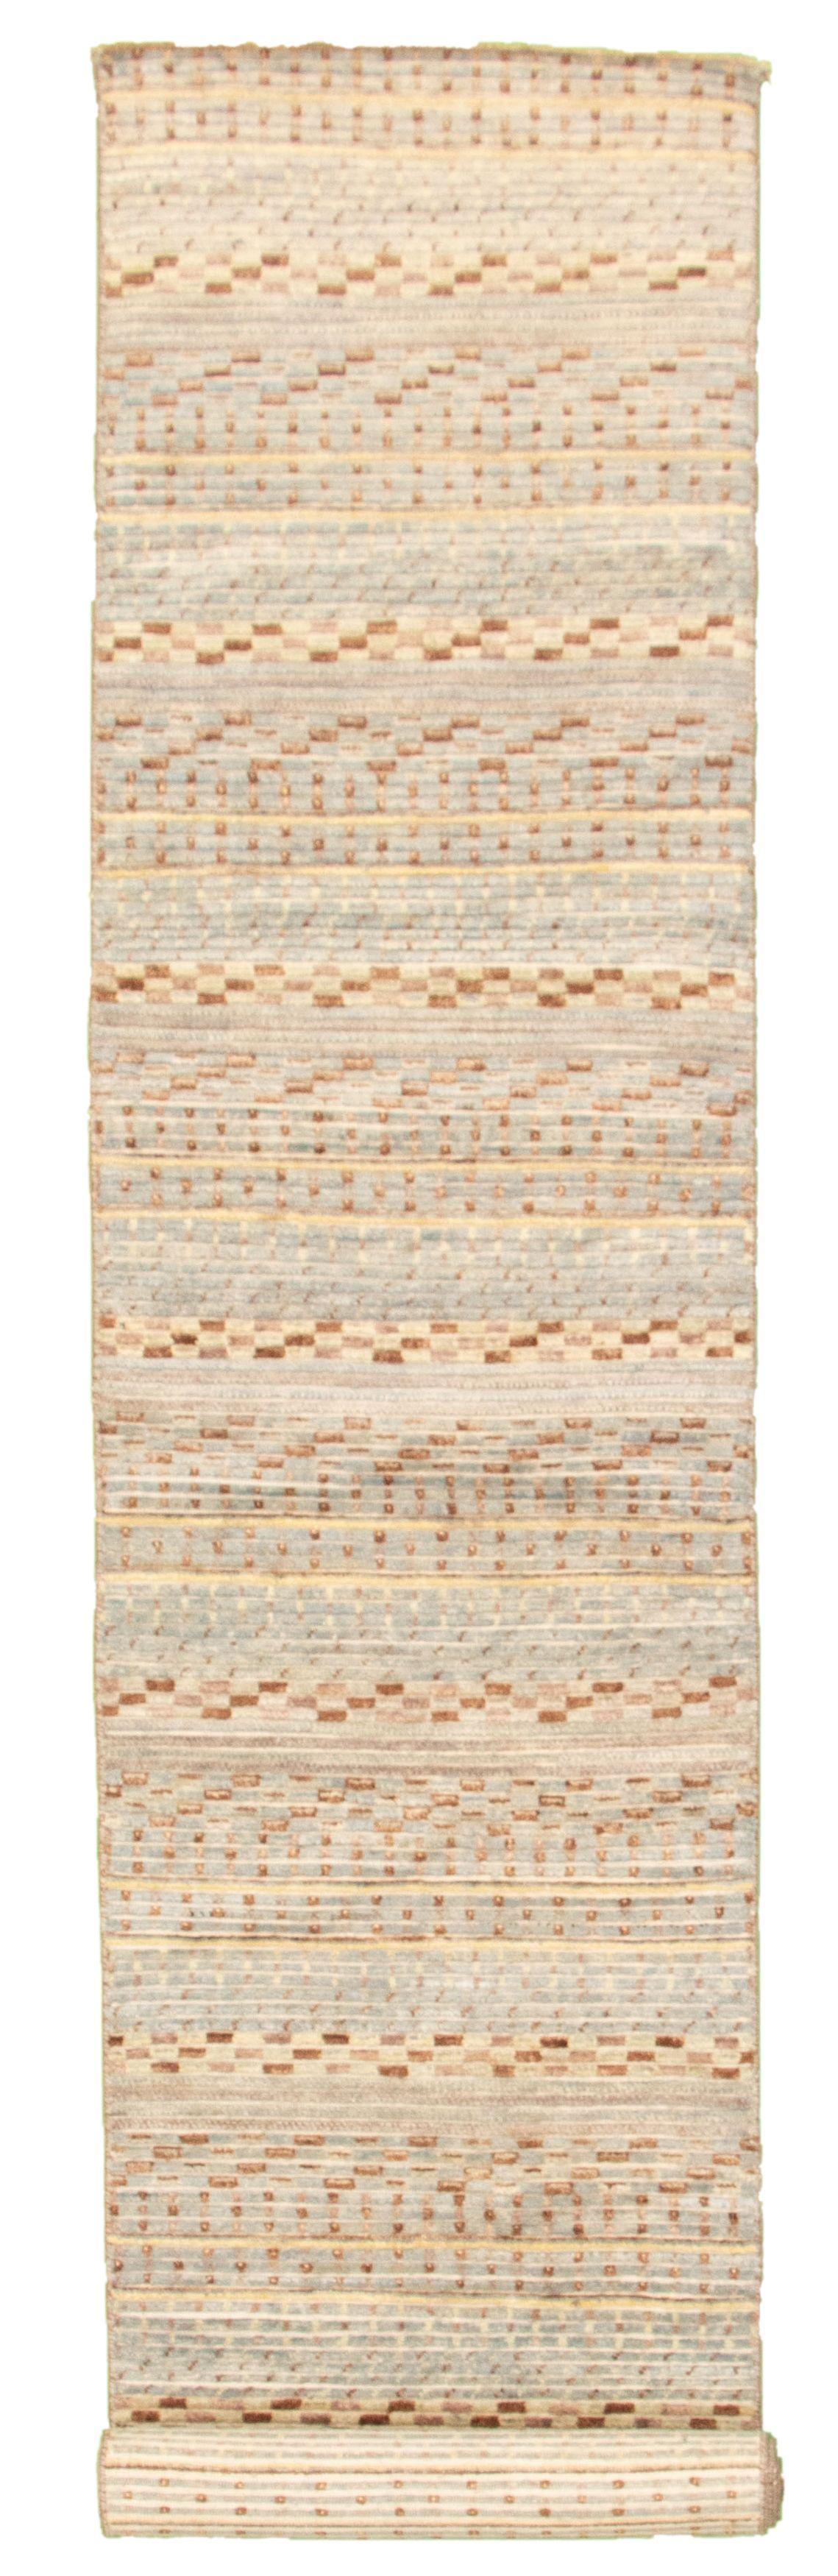 "Hand-knotted Peshawar Ziegler Light Blue  Wool Rug 2'7"" x 14'5"" Size: 2'7"" x 14'5"""